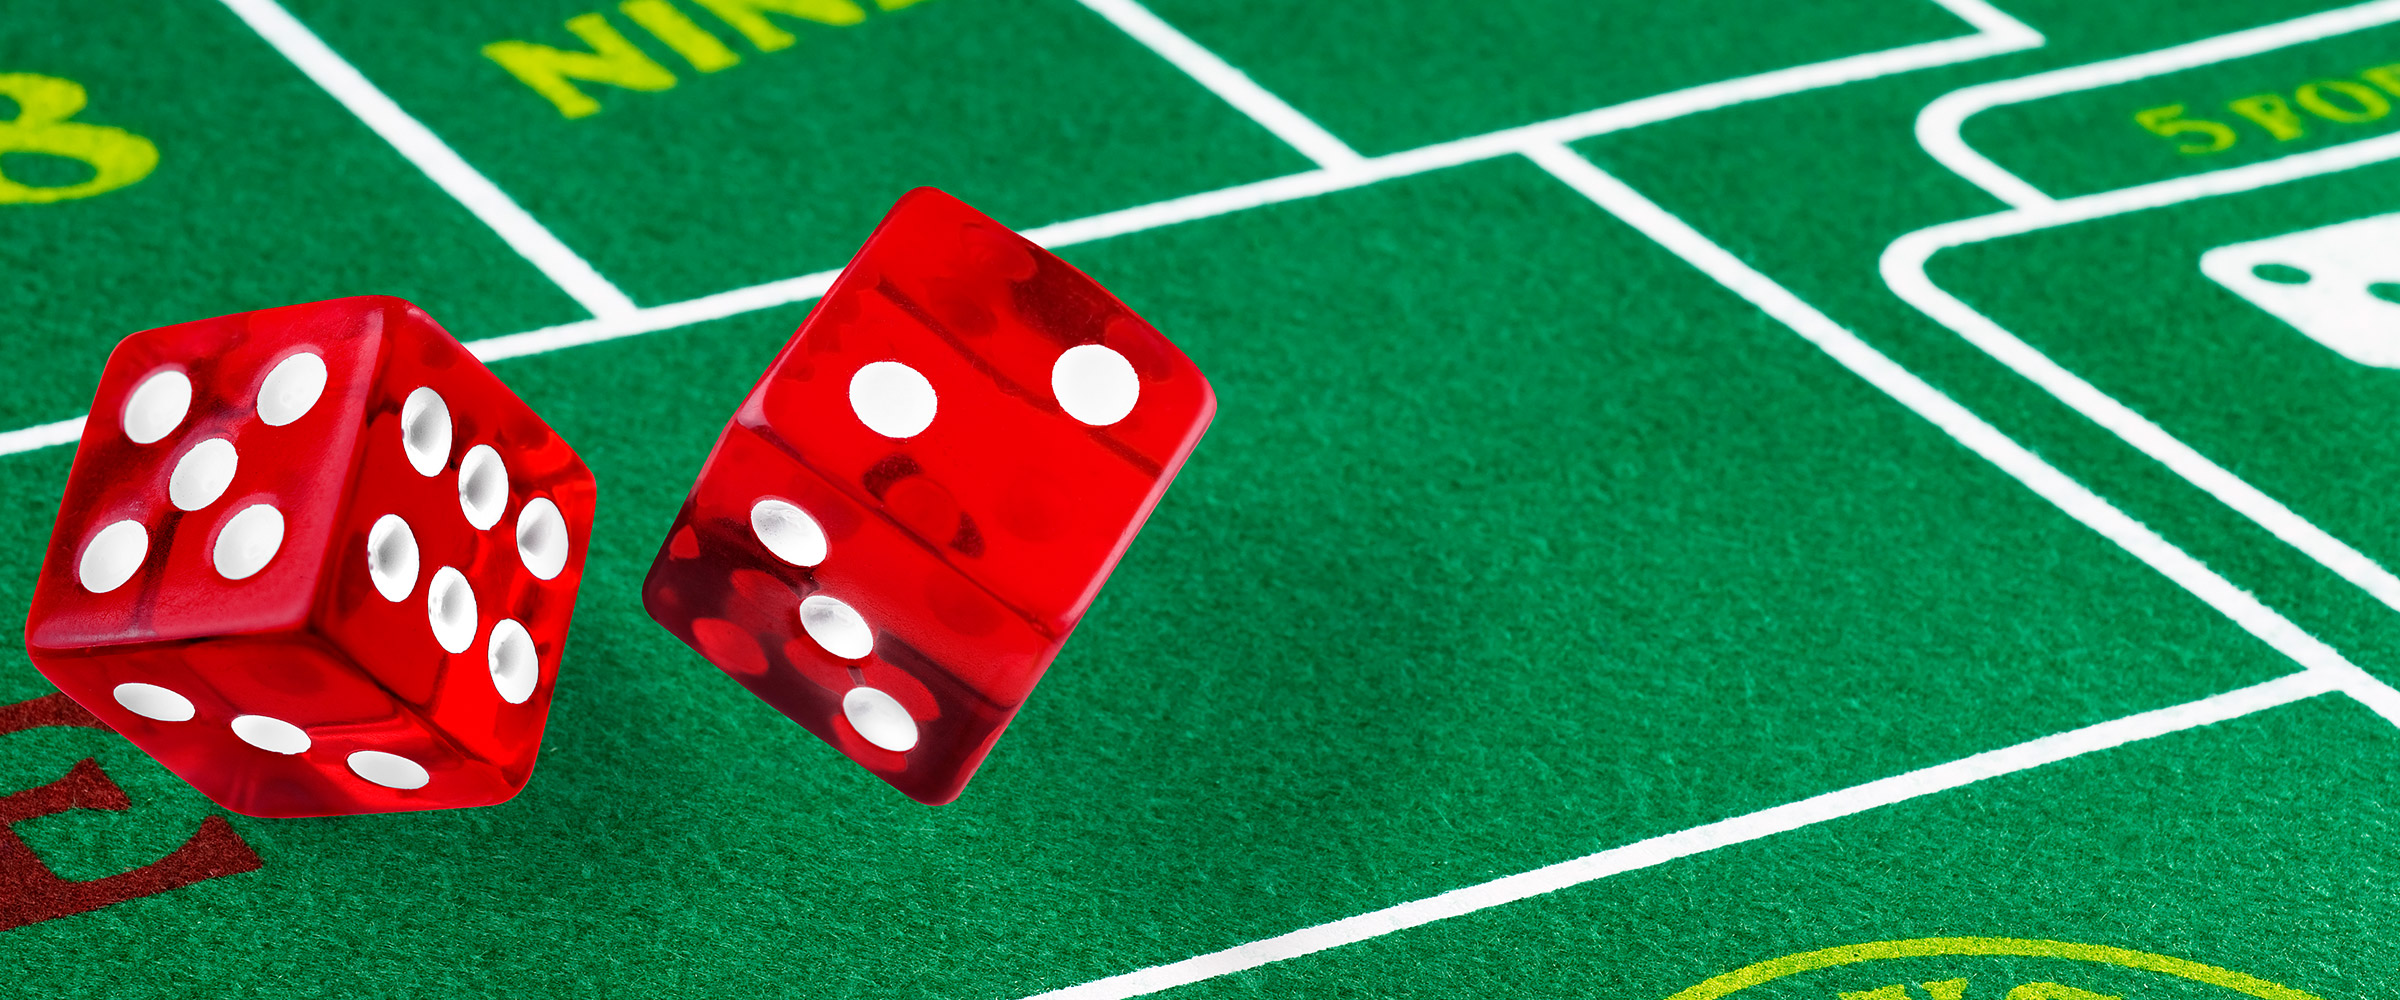 Go for online gambling sites